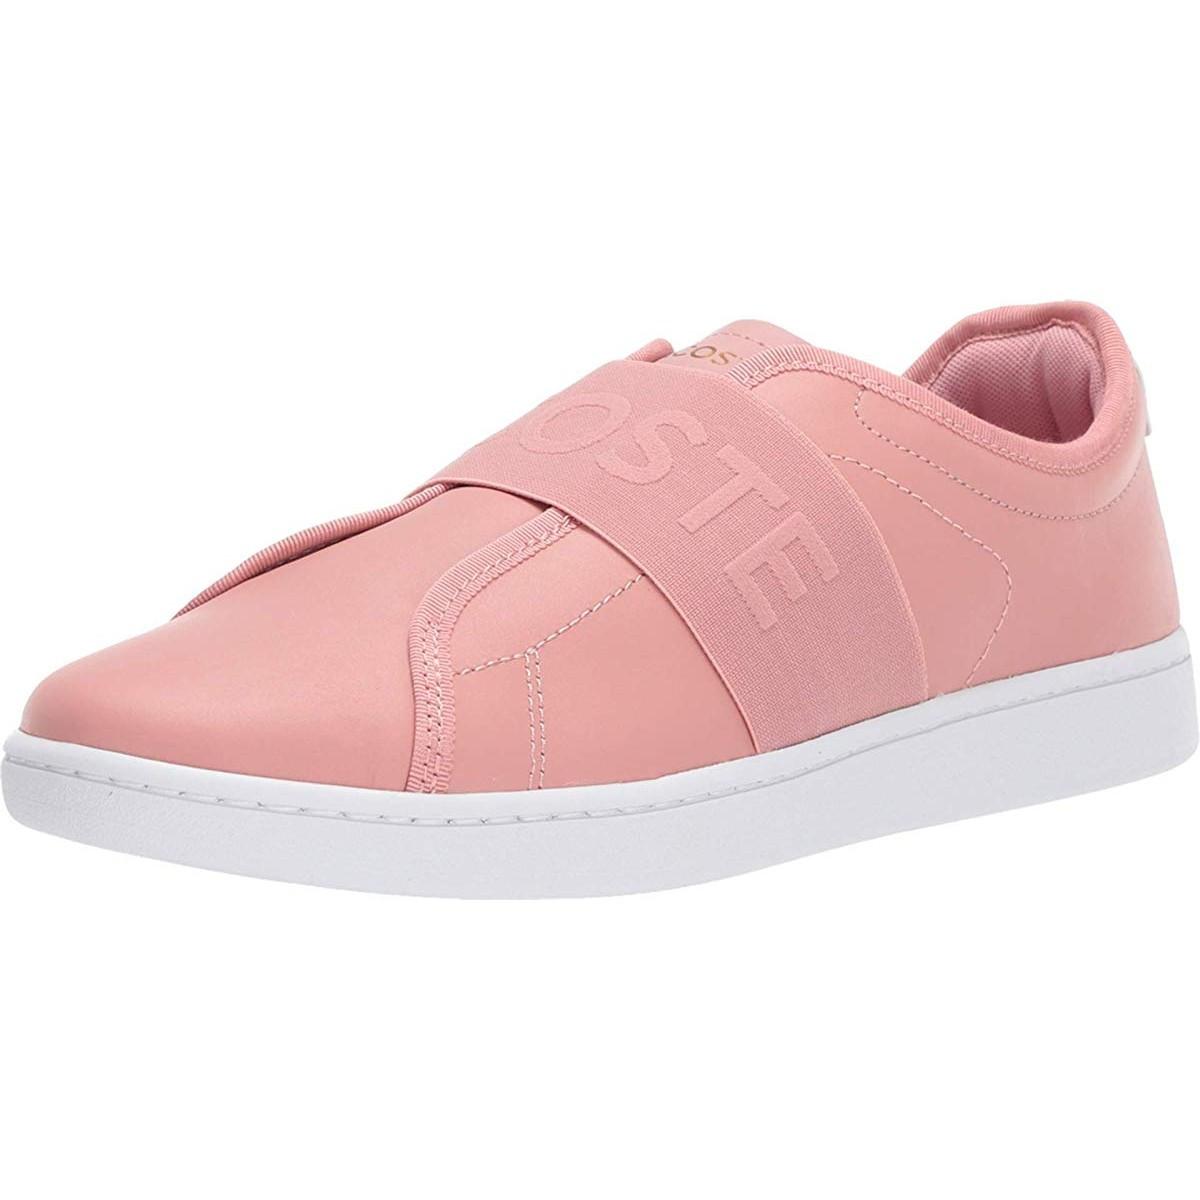 Кроссовки Lacoste Carnaby Evo Slip 318 1 Pink - Оригинал, фото 1